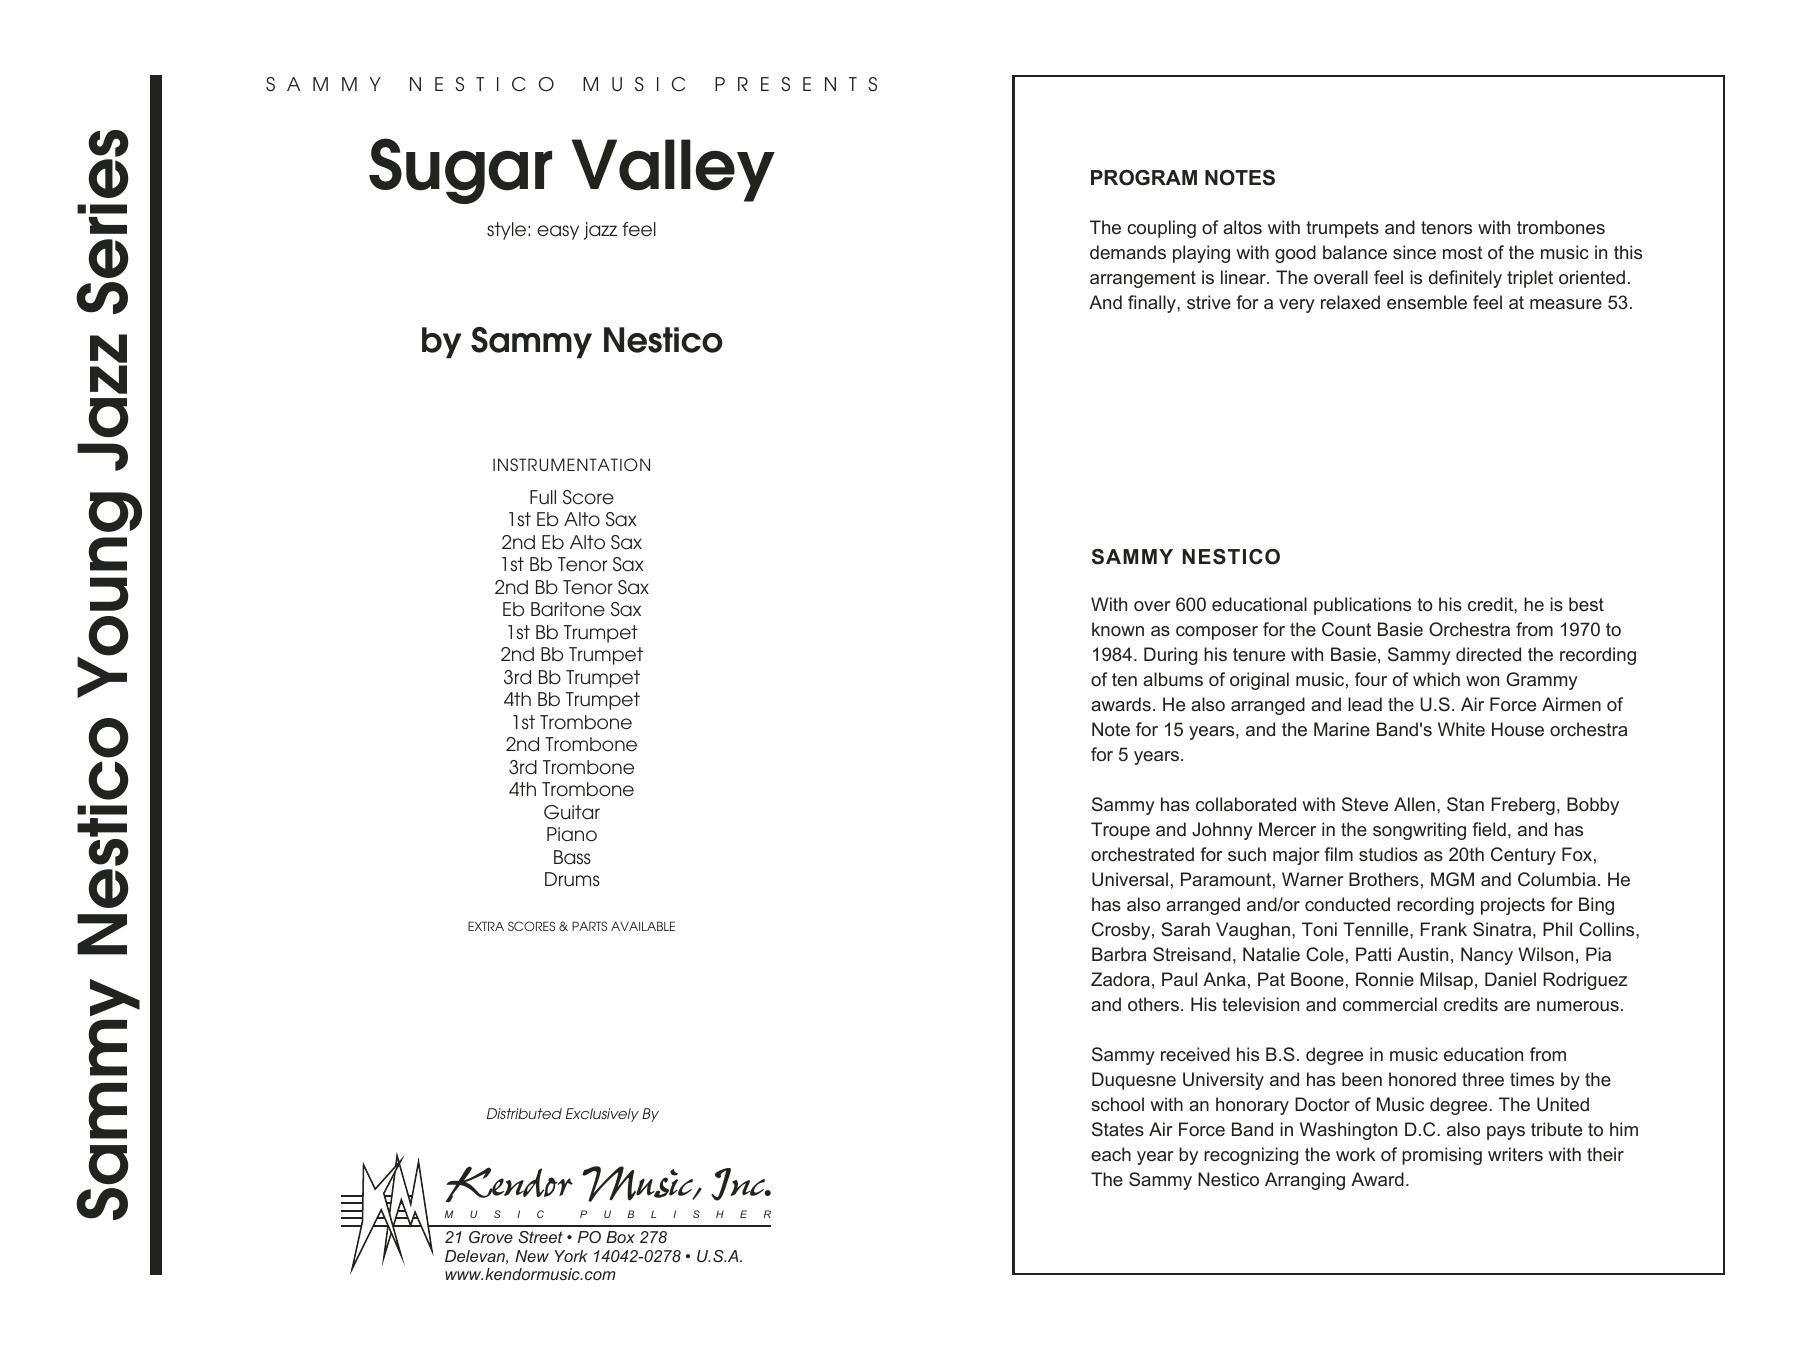 Sugar Valley - Full Score Sheet Music